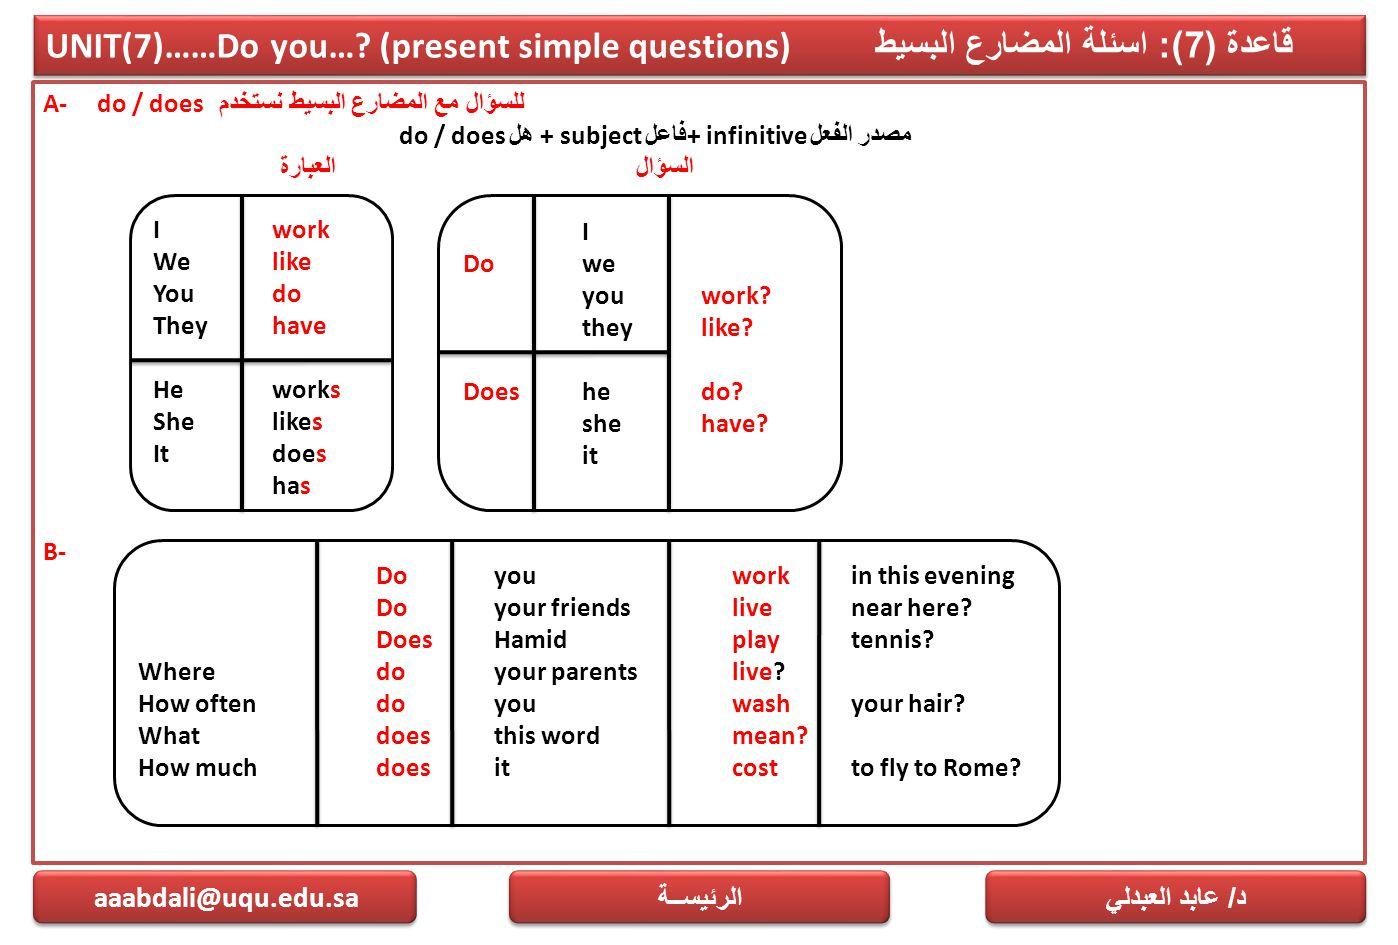 UNIT(7)……Do you…? (present simple questions) قاعدة (7): اسئلة المضارع البسيط A- do / does للسؤال مع المضارع البسيط نستخدم do / does هل + subject فاعل